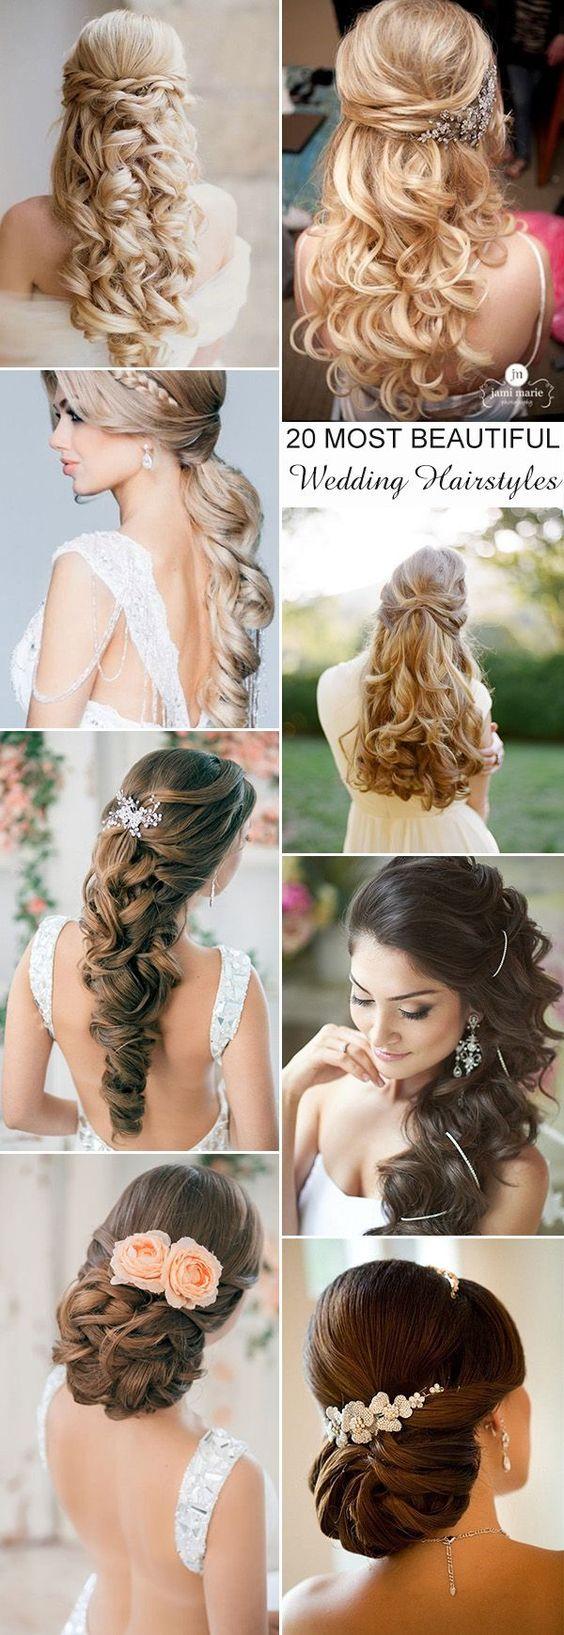 20 most elegant and beautiful wedding hairstyles | beautiful